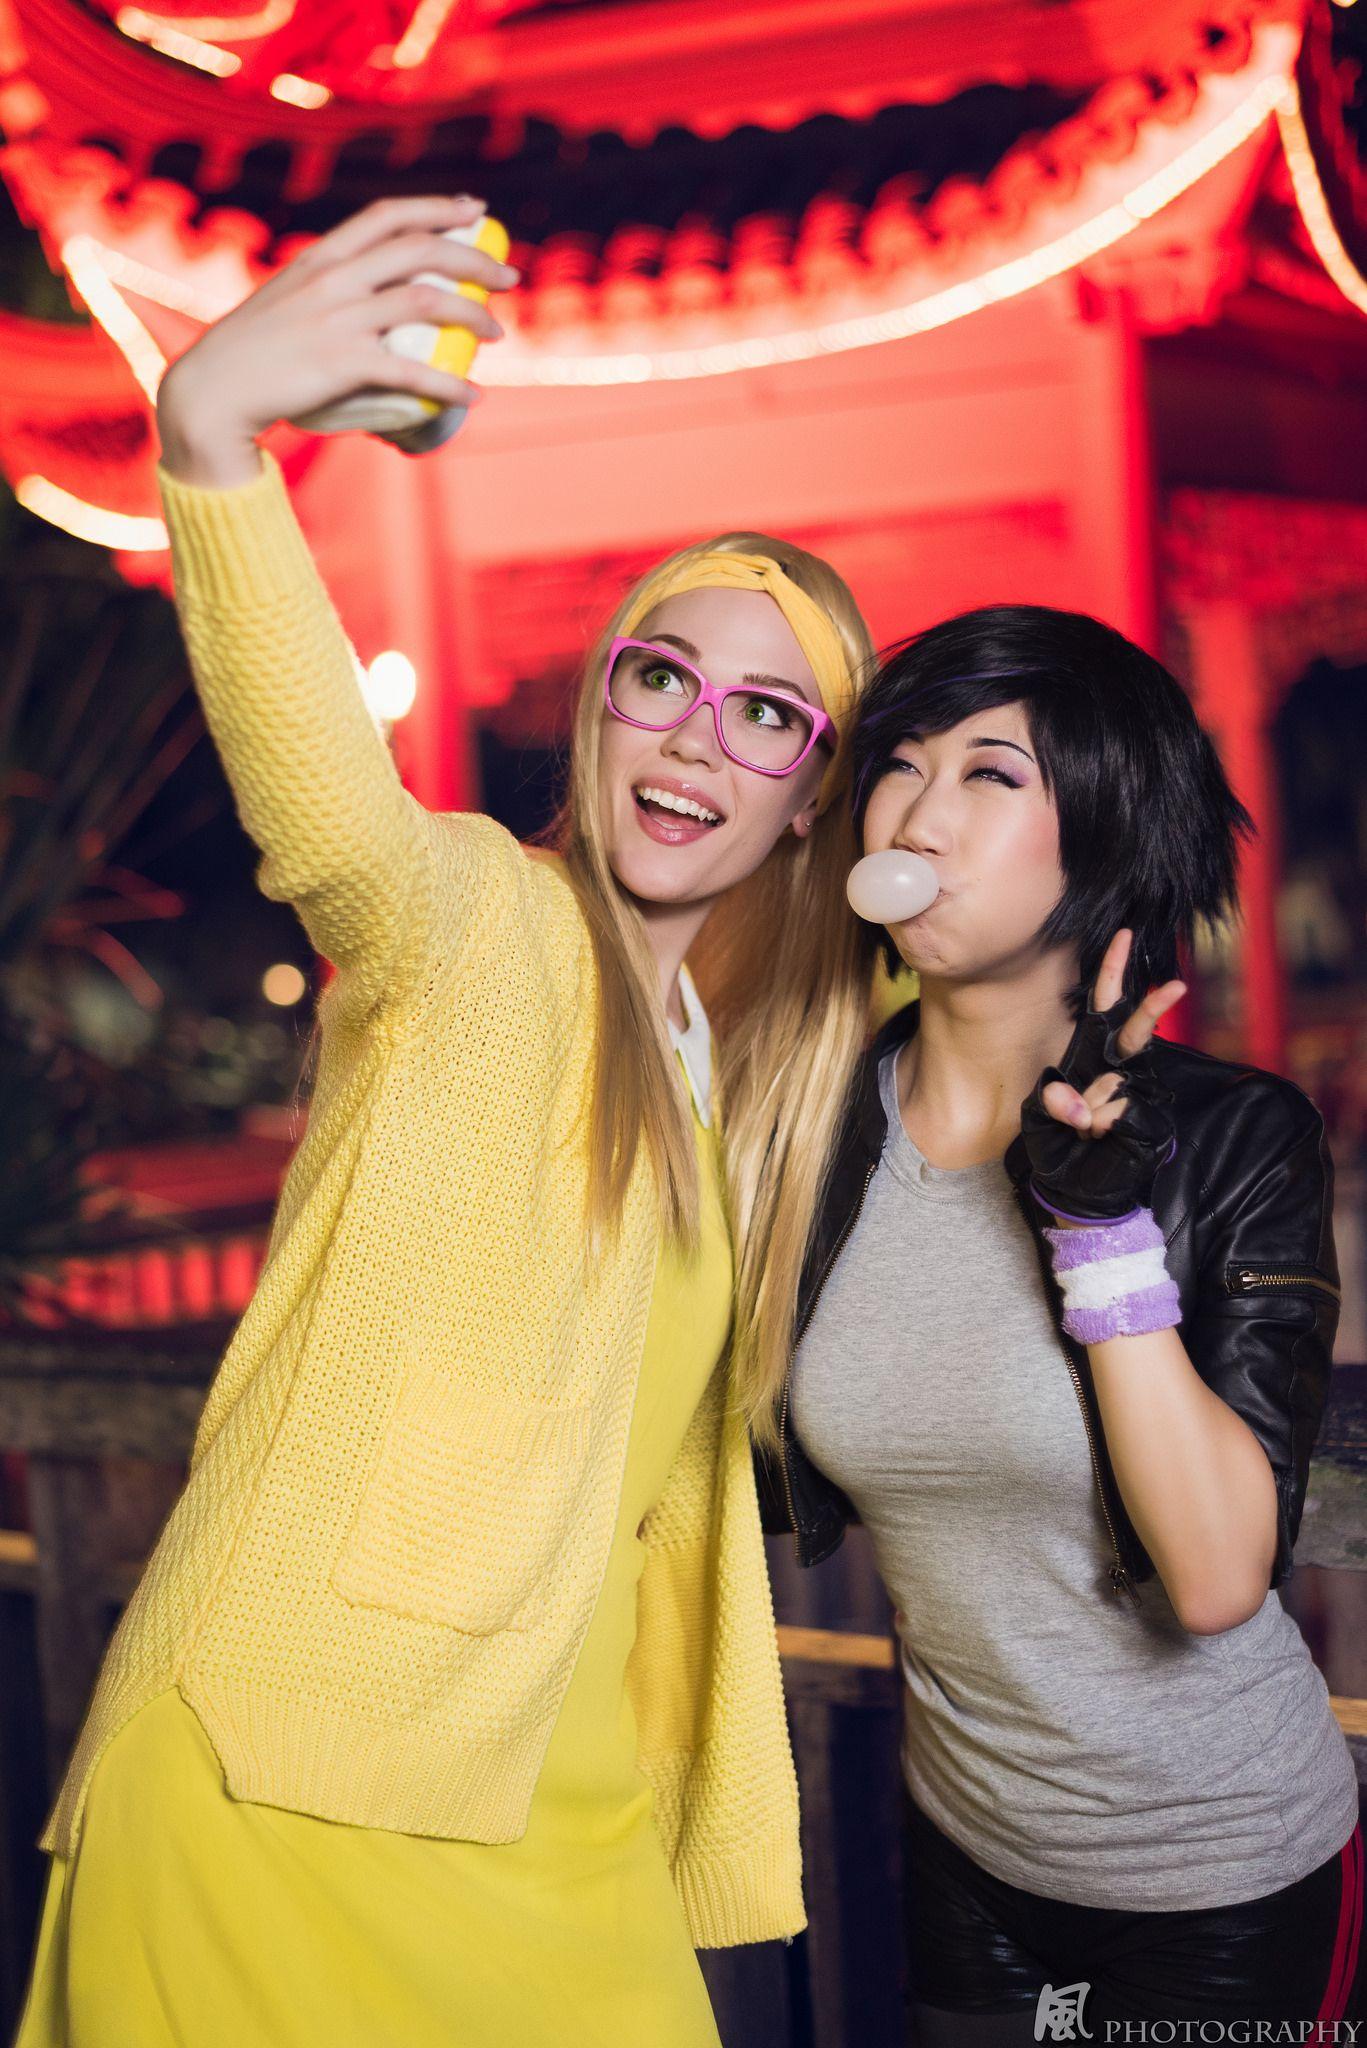 Honey Lemon and Gogo Tomago Cosplay by 1LunchBox on DeviantArt